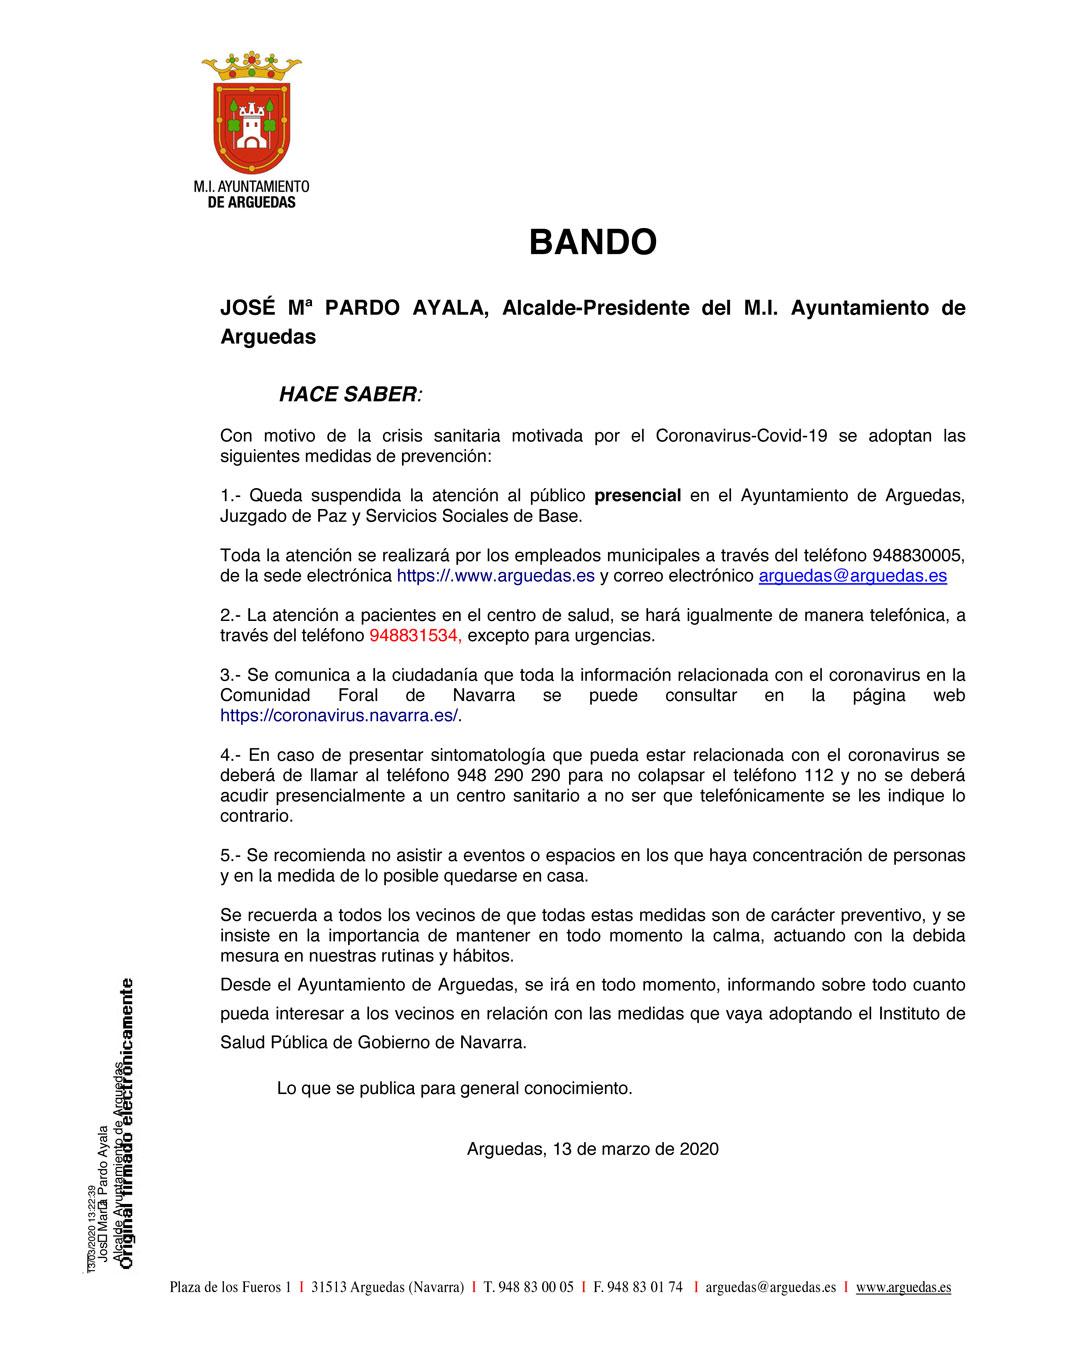 BANDO CORONAVIRUS 13 MARZO 2020